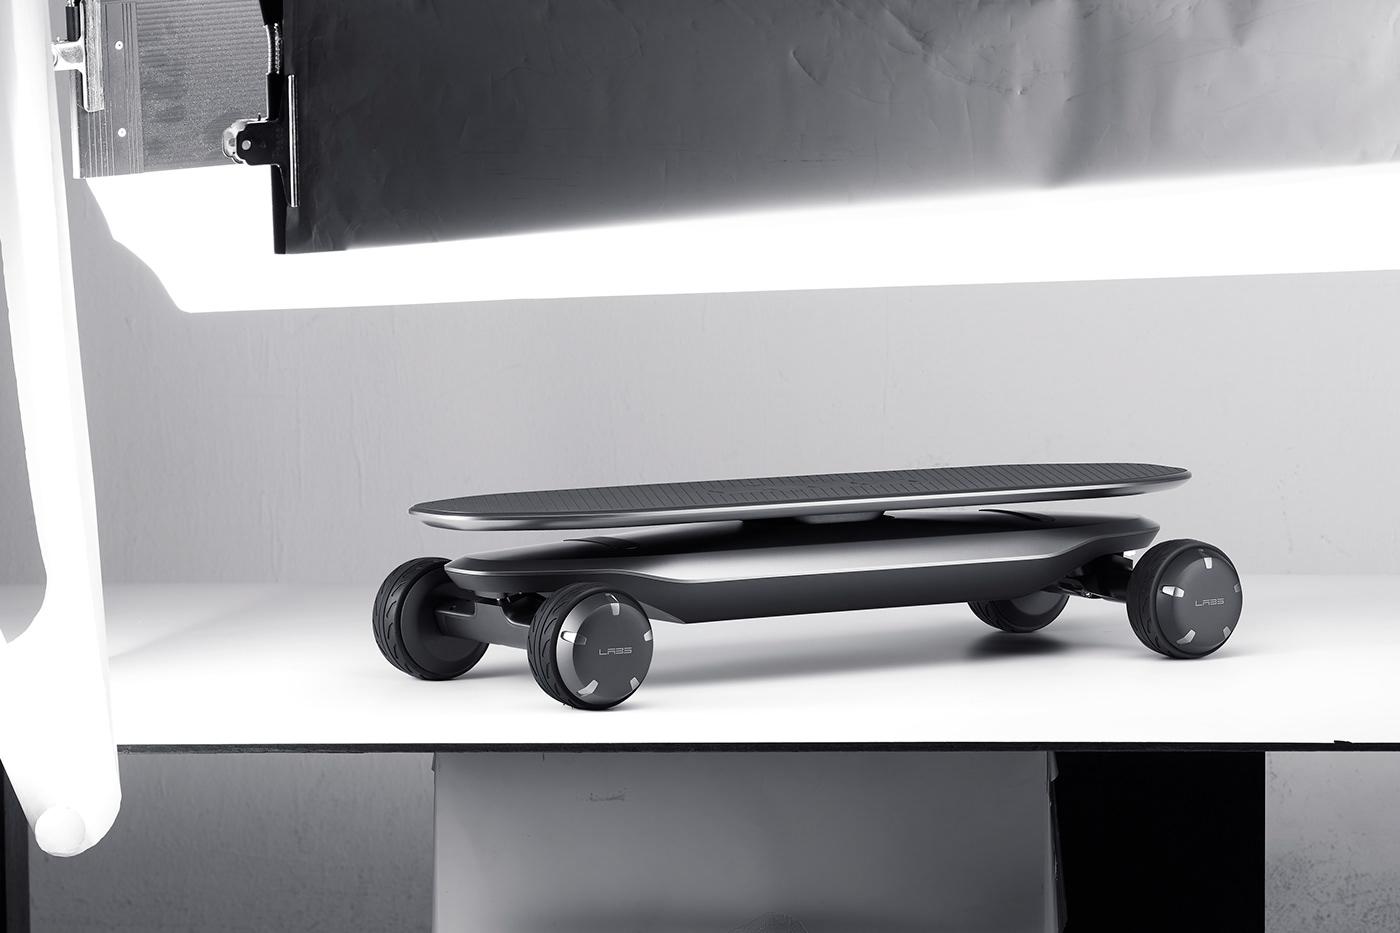 PLMM skateboard designed by VLND.